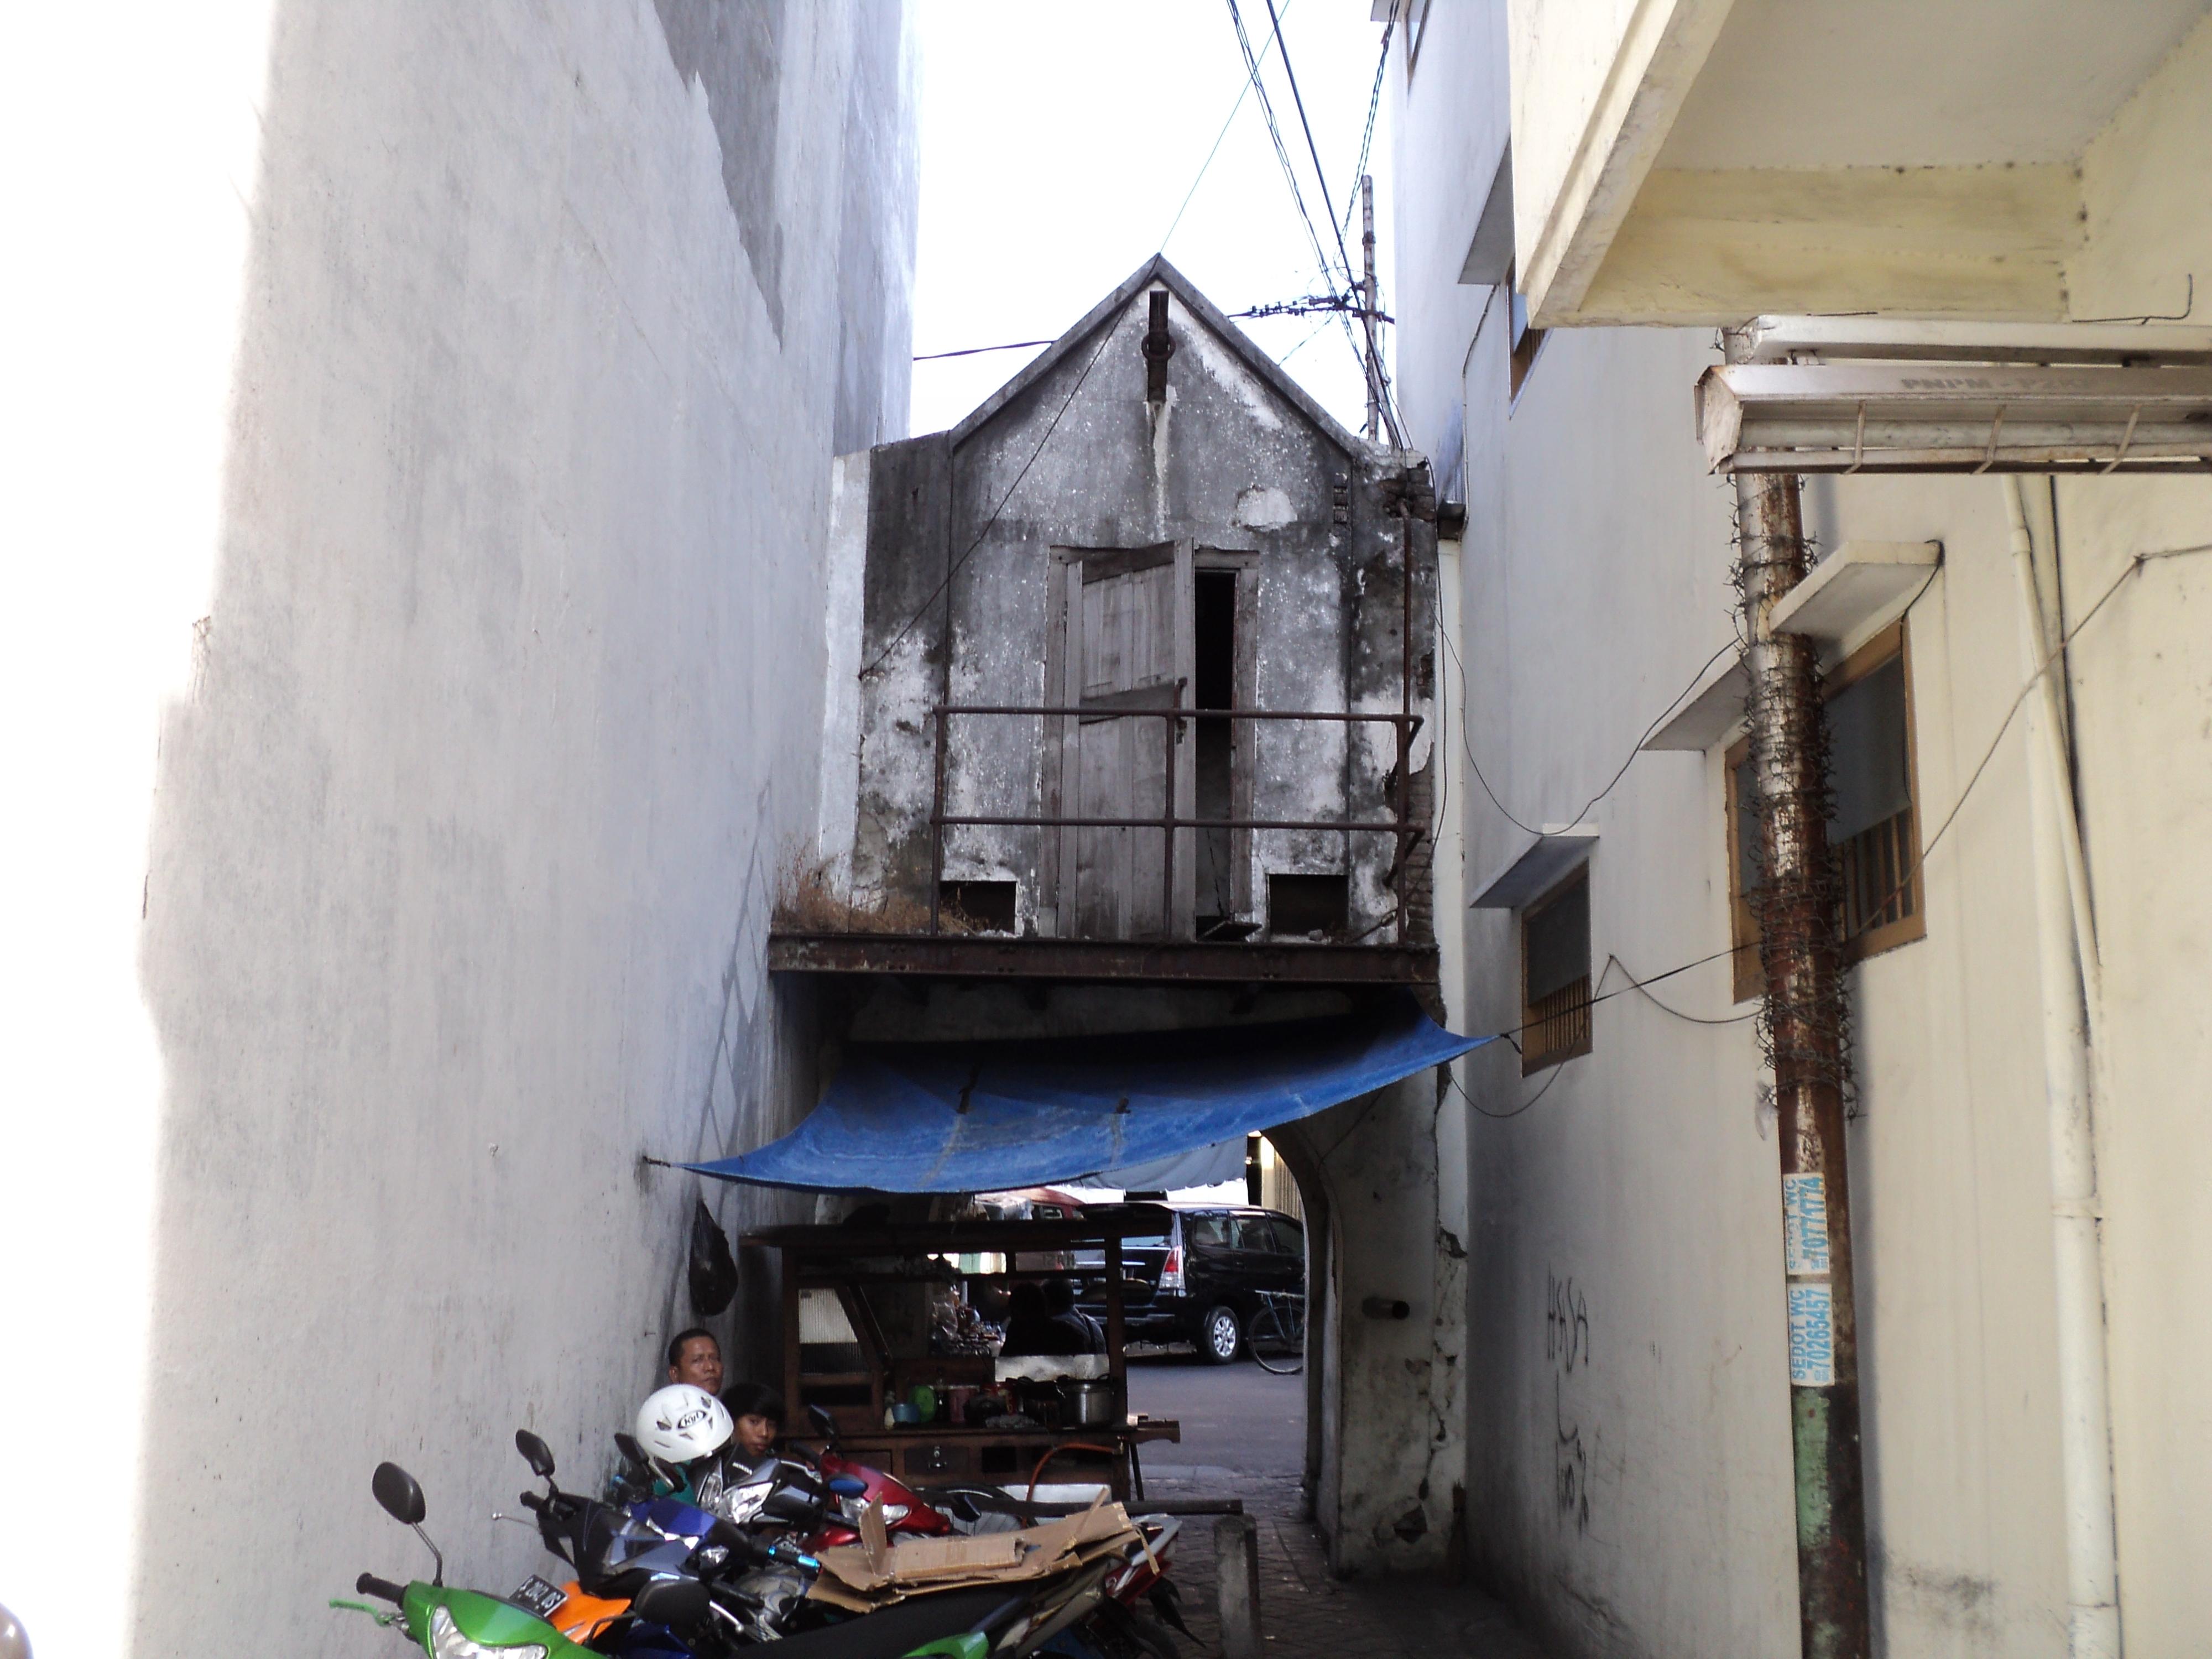 tampak belakang dari sebuah bangunan yang diyakini sebagai gerbang Keraton Surabaya. Bangunan tersebut kini diapit oleh pertokoan. (sumber foto: pesonacagarbudayasurabaya.wordpress.com)